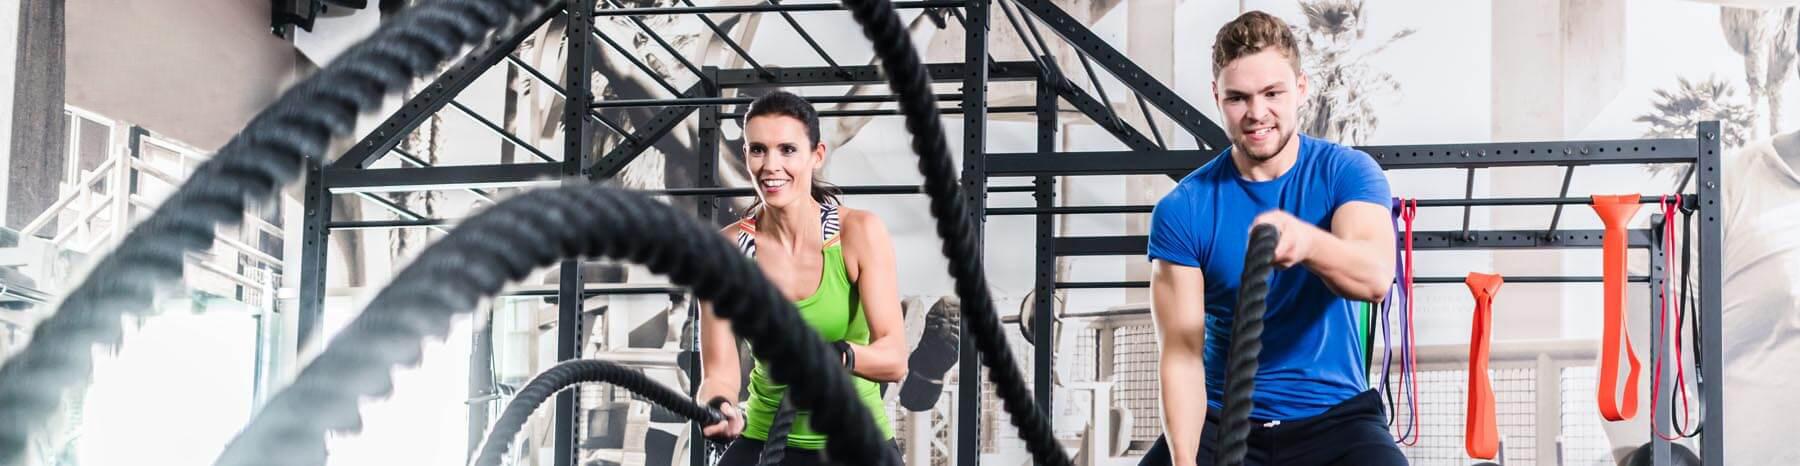 Fitness Centers - Lake Havasu City